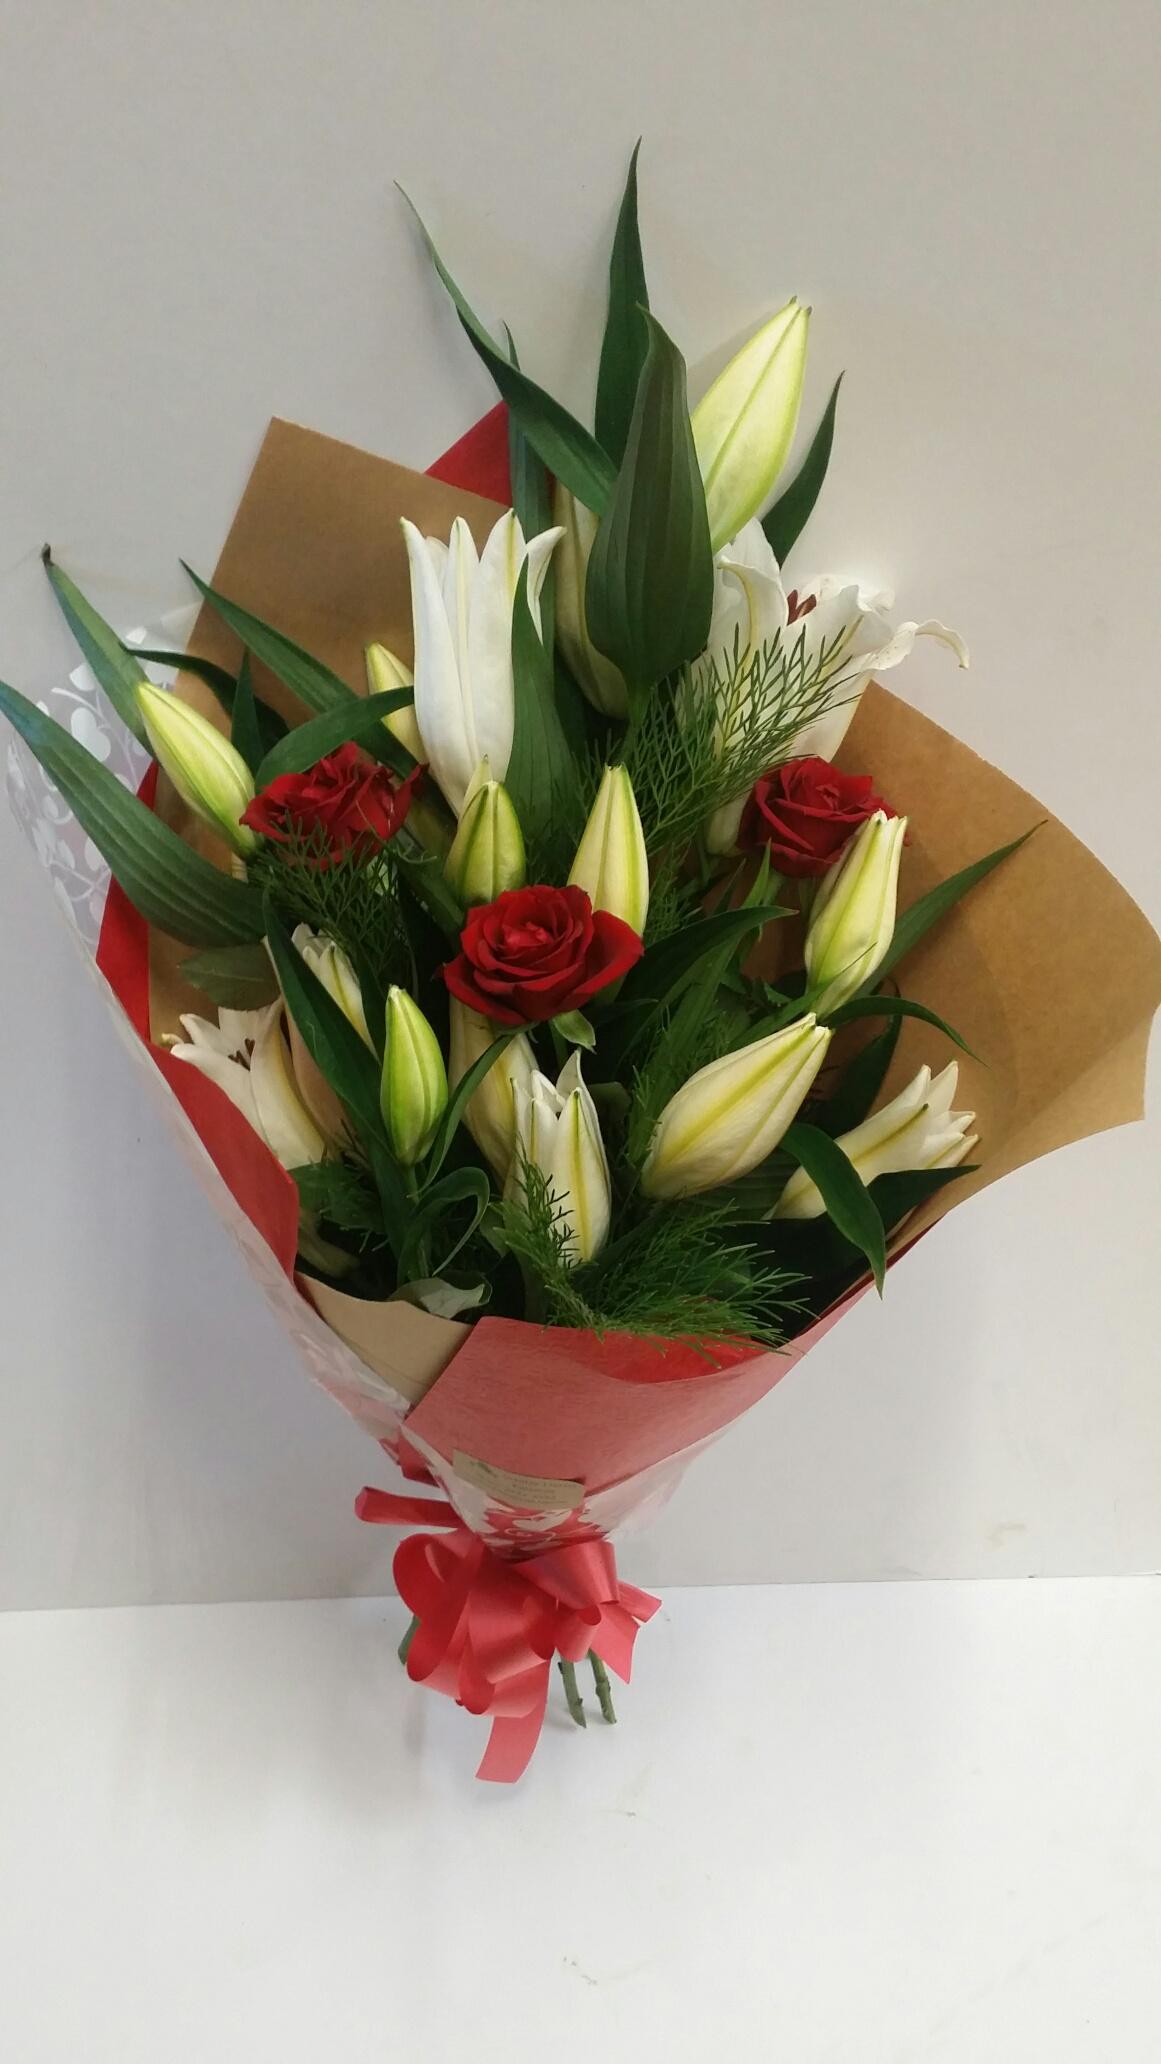 Lily rose bouquet 6 roses whites florist 20140210105755resized izmirmasajfo